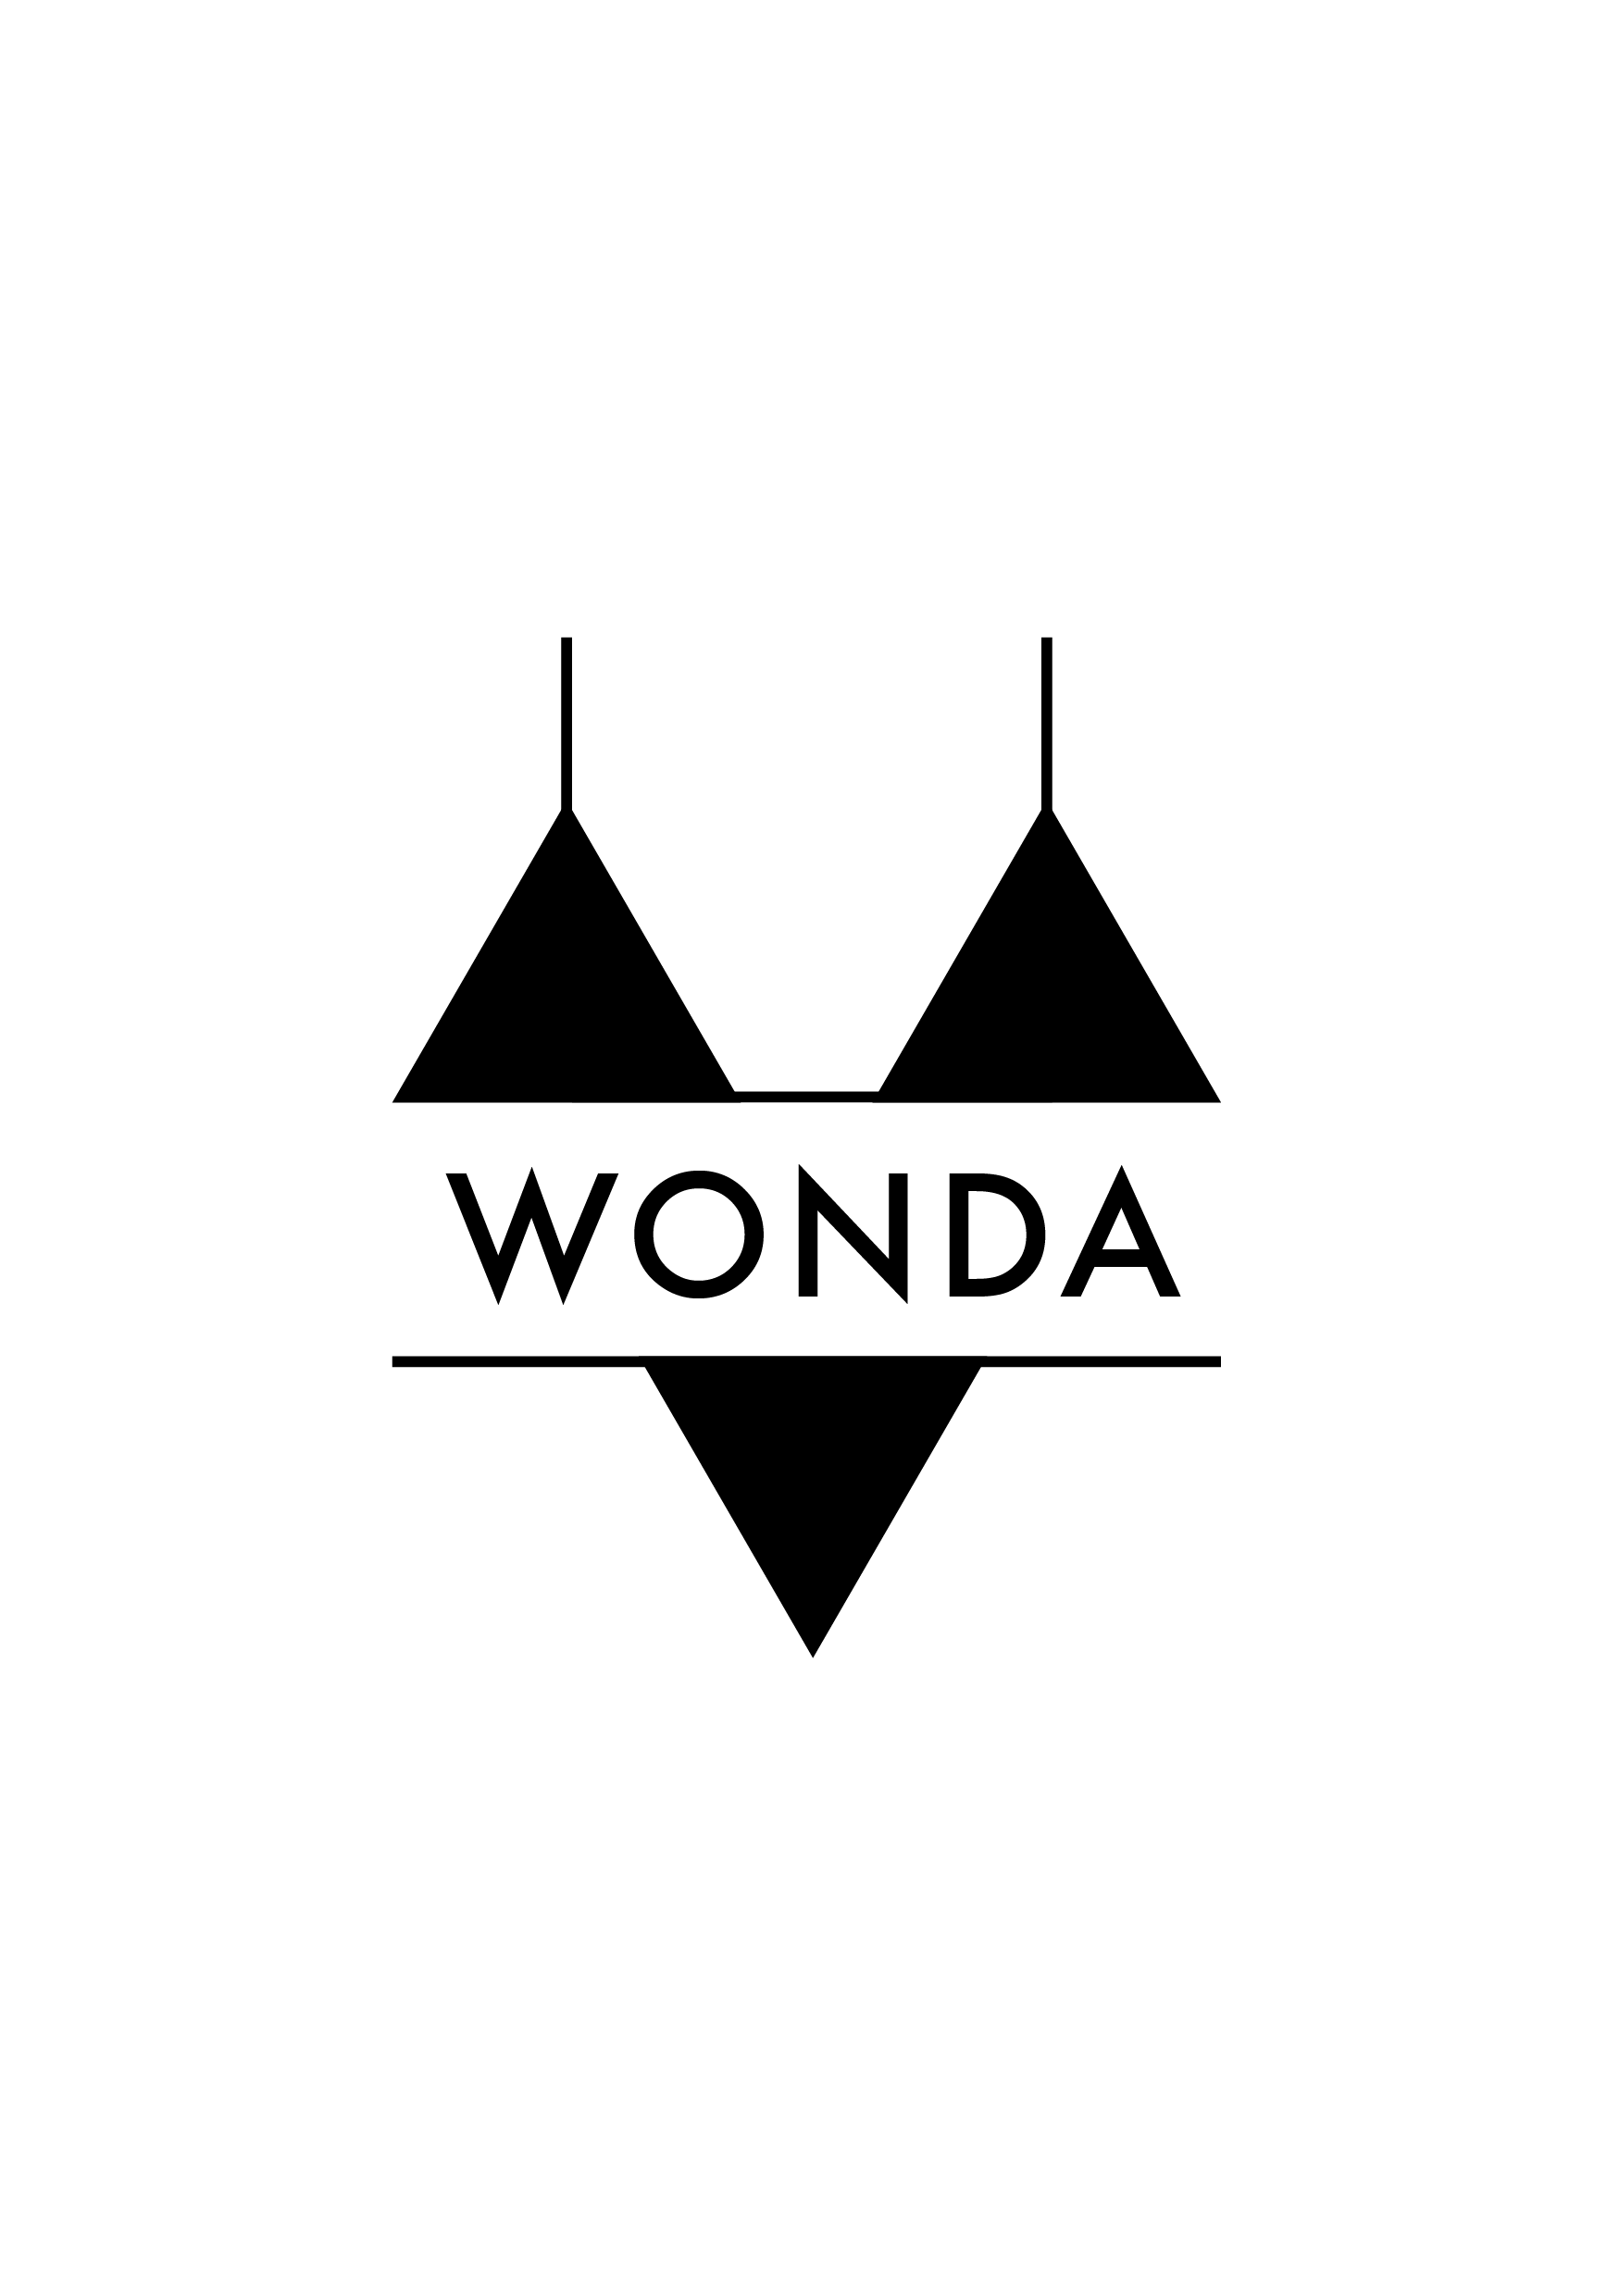 WONDA swim